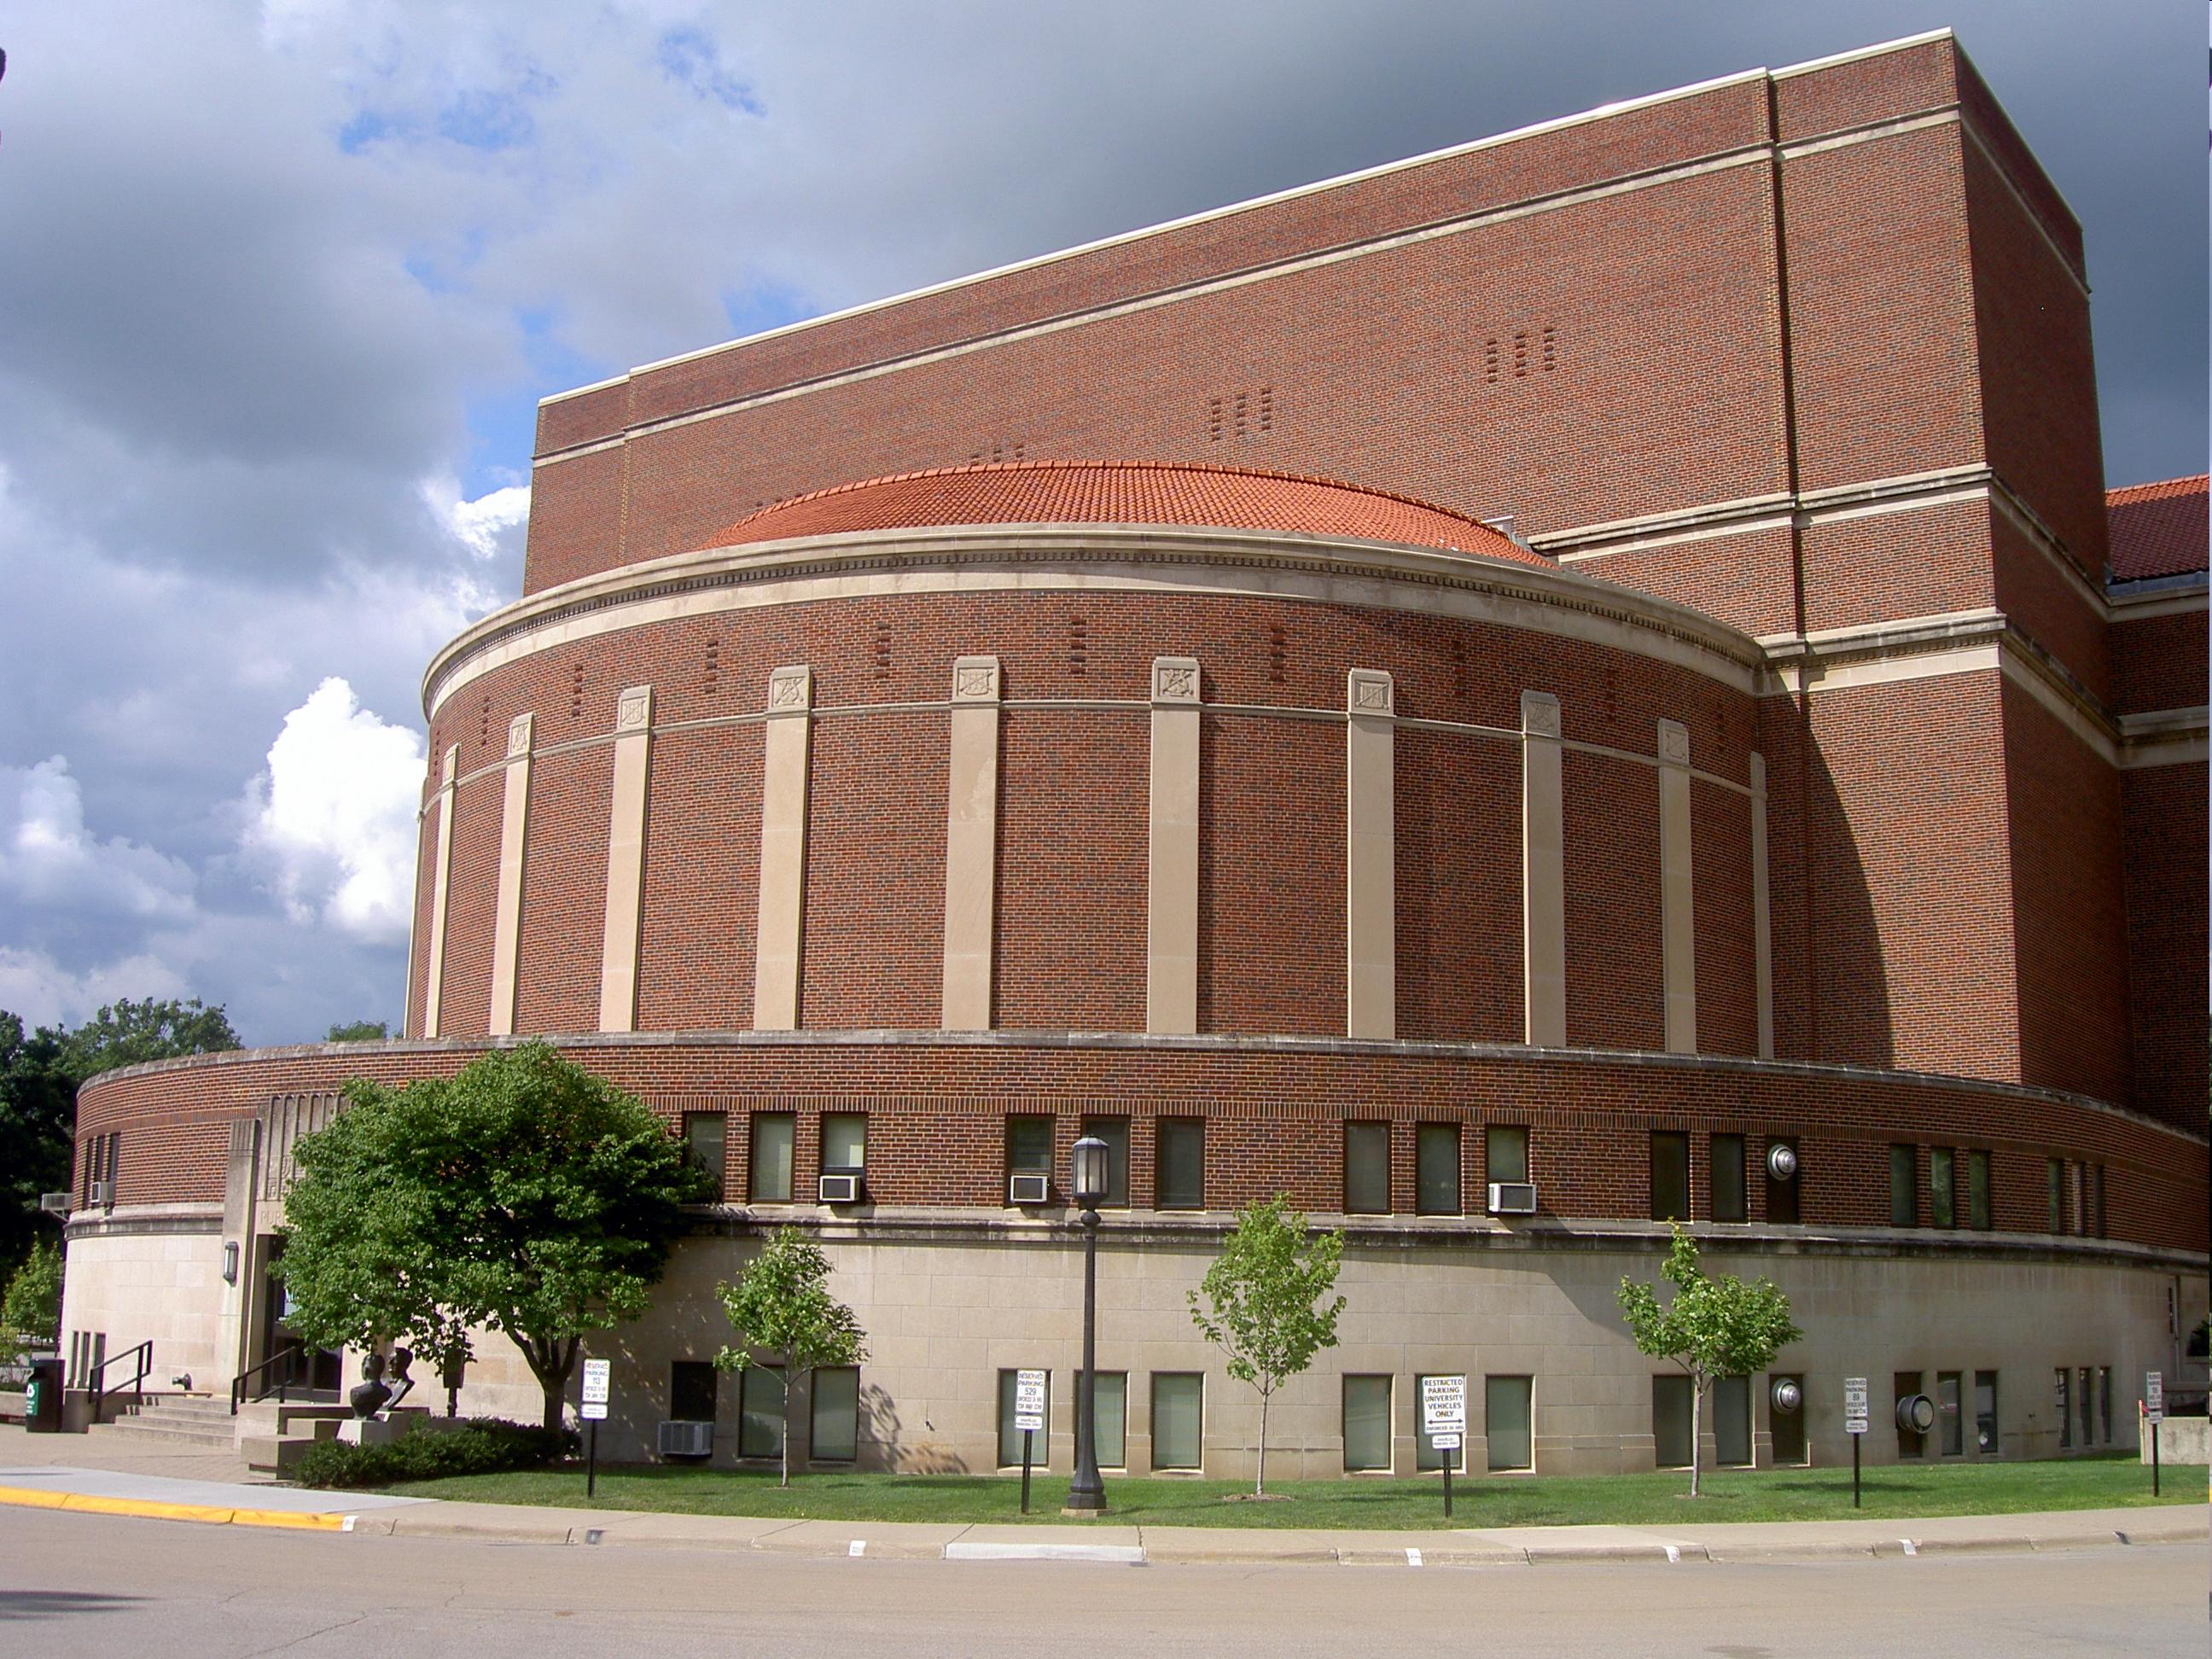 Elliot Hall Of Music West Lafayette Indiana Purdue University Purdue Campus